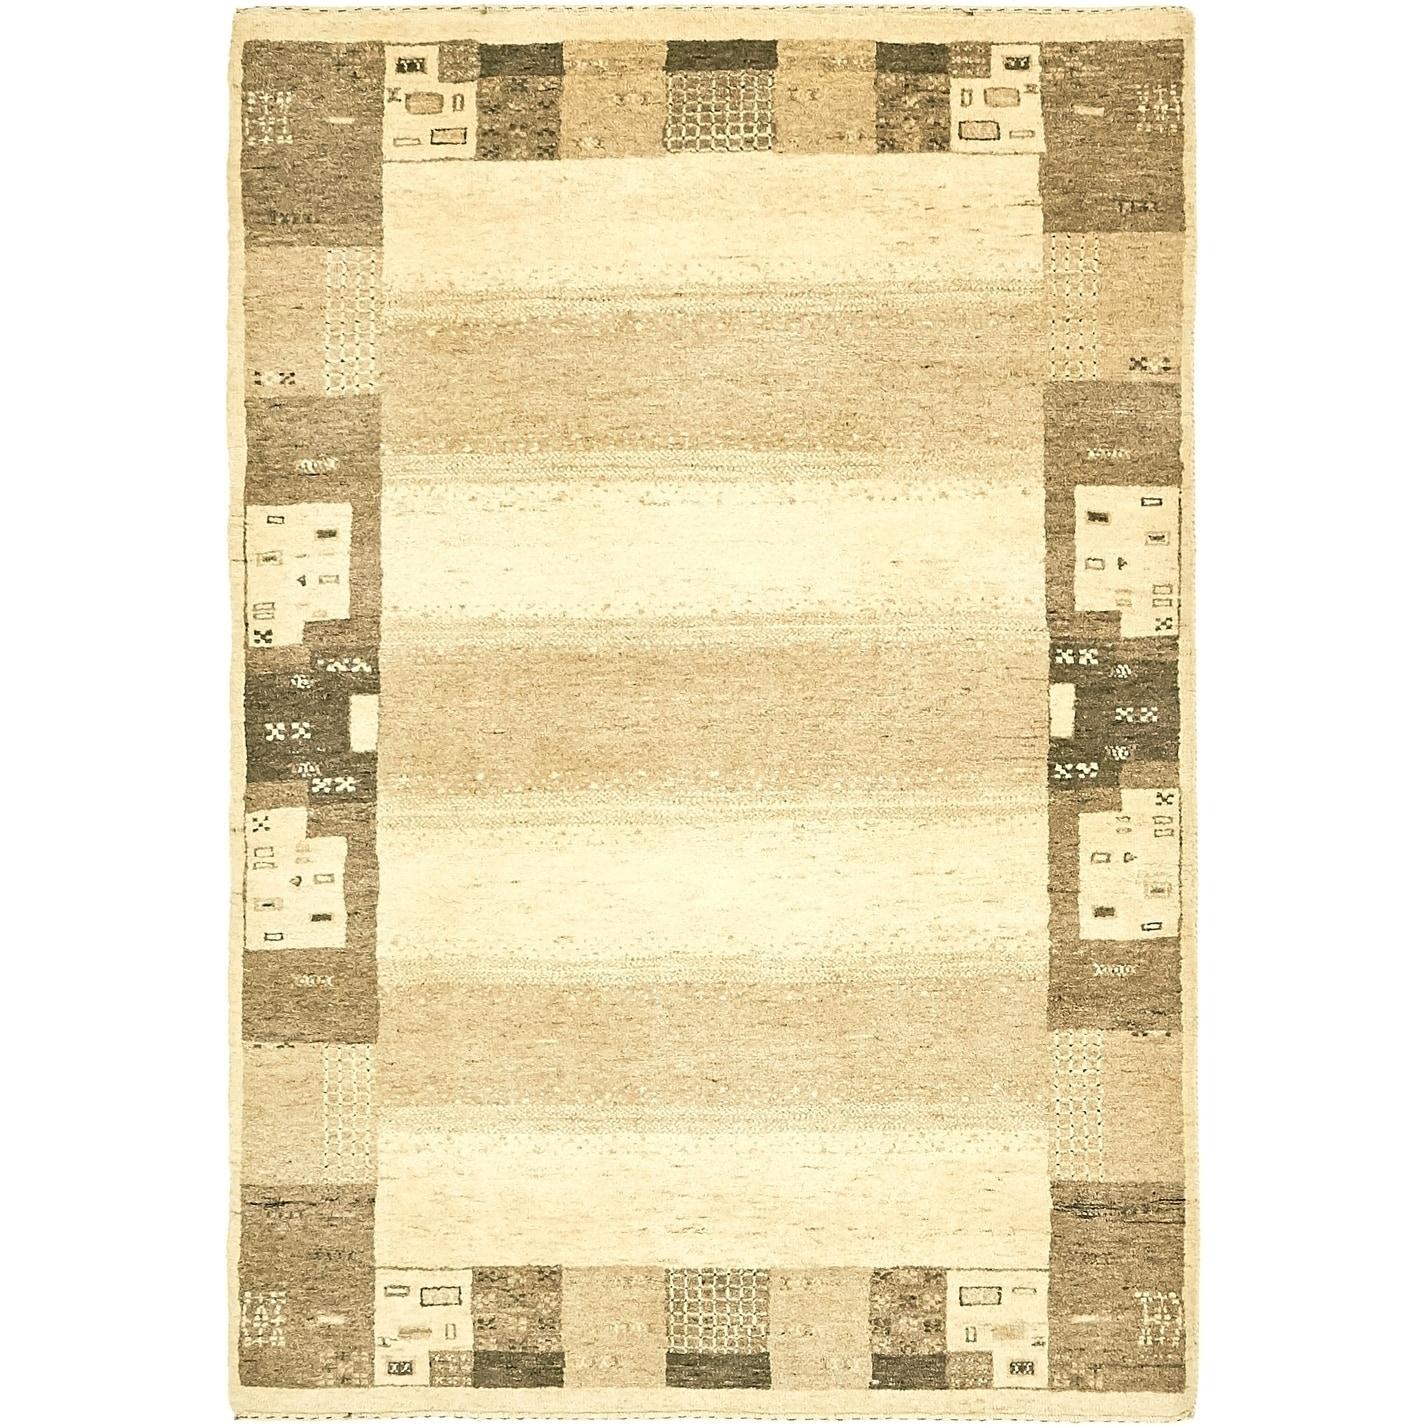 Hand Knotted Kashkuli Gabbeh Wool Area Rug - 4 x 5 9 (Beige - 4 x 5 9)